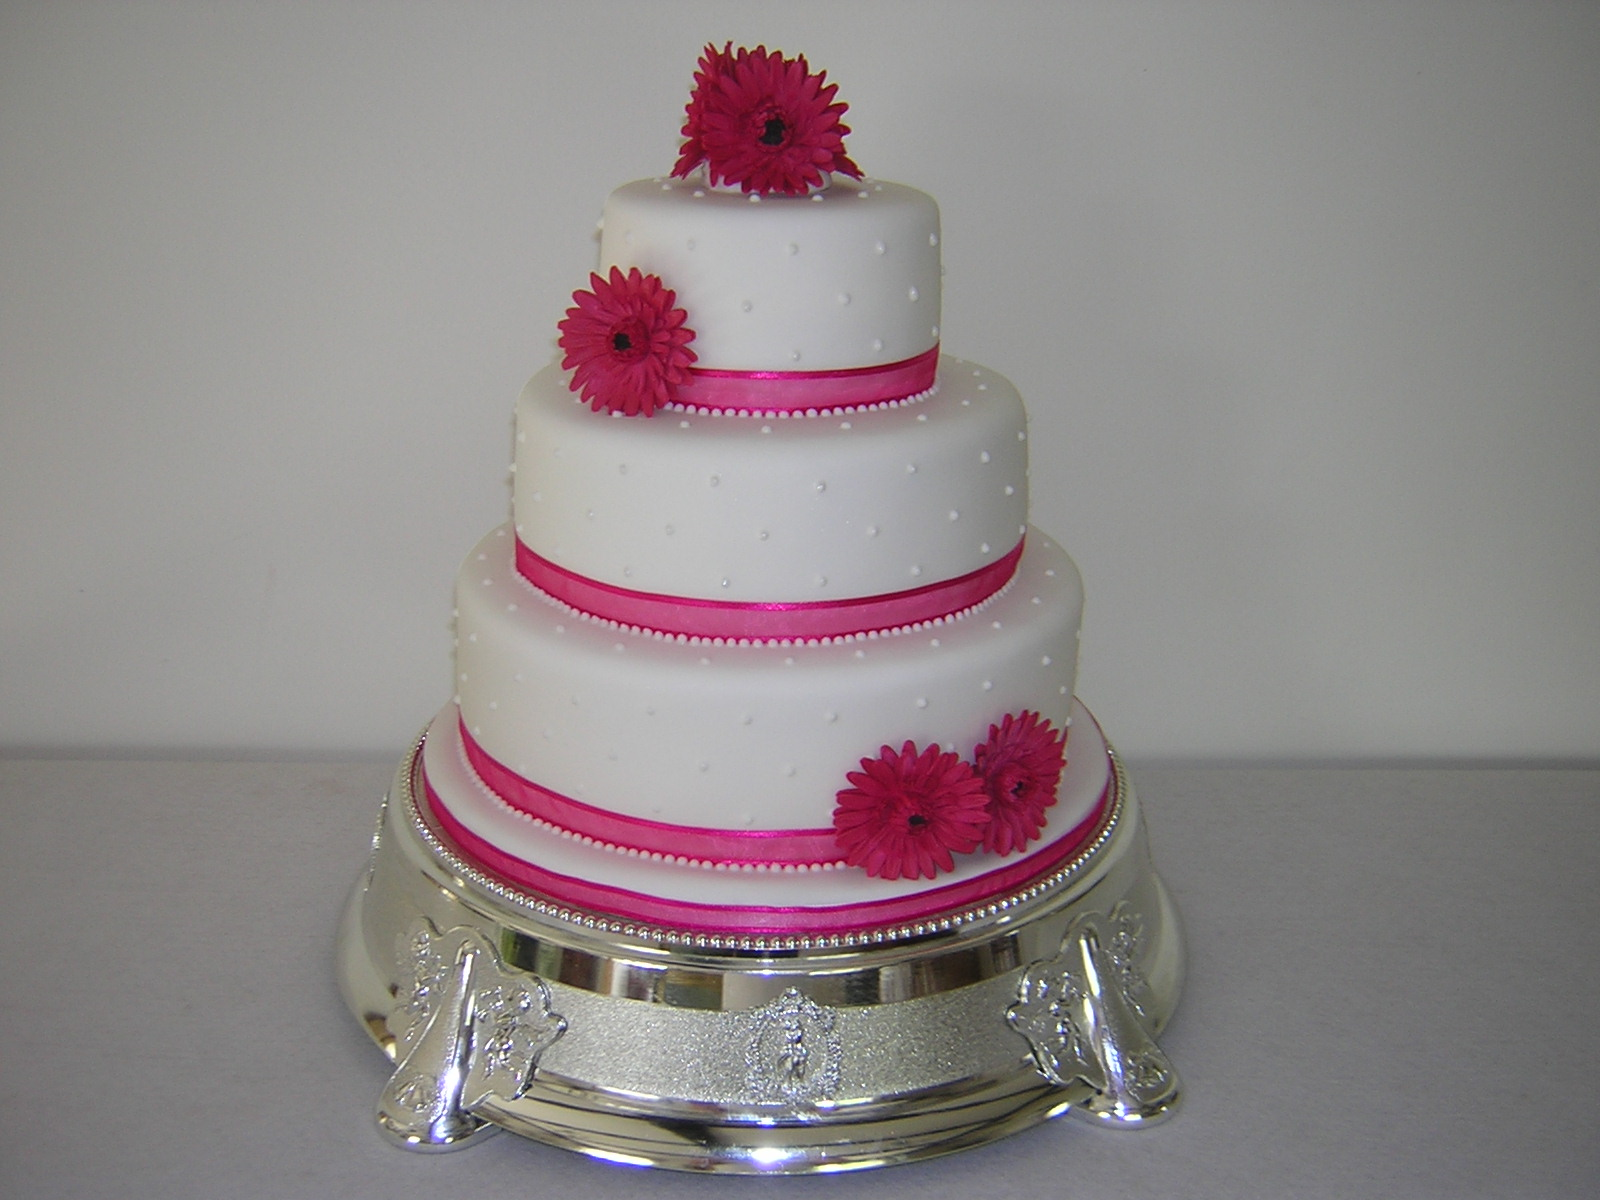 10 Hot Pink 3 Tier Elegant Wedding Cakes Photo 3 Tier Wedding Cake